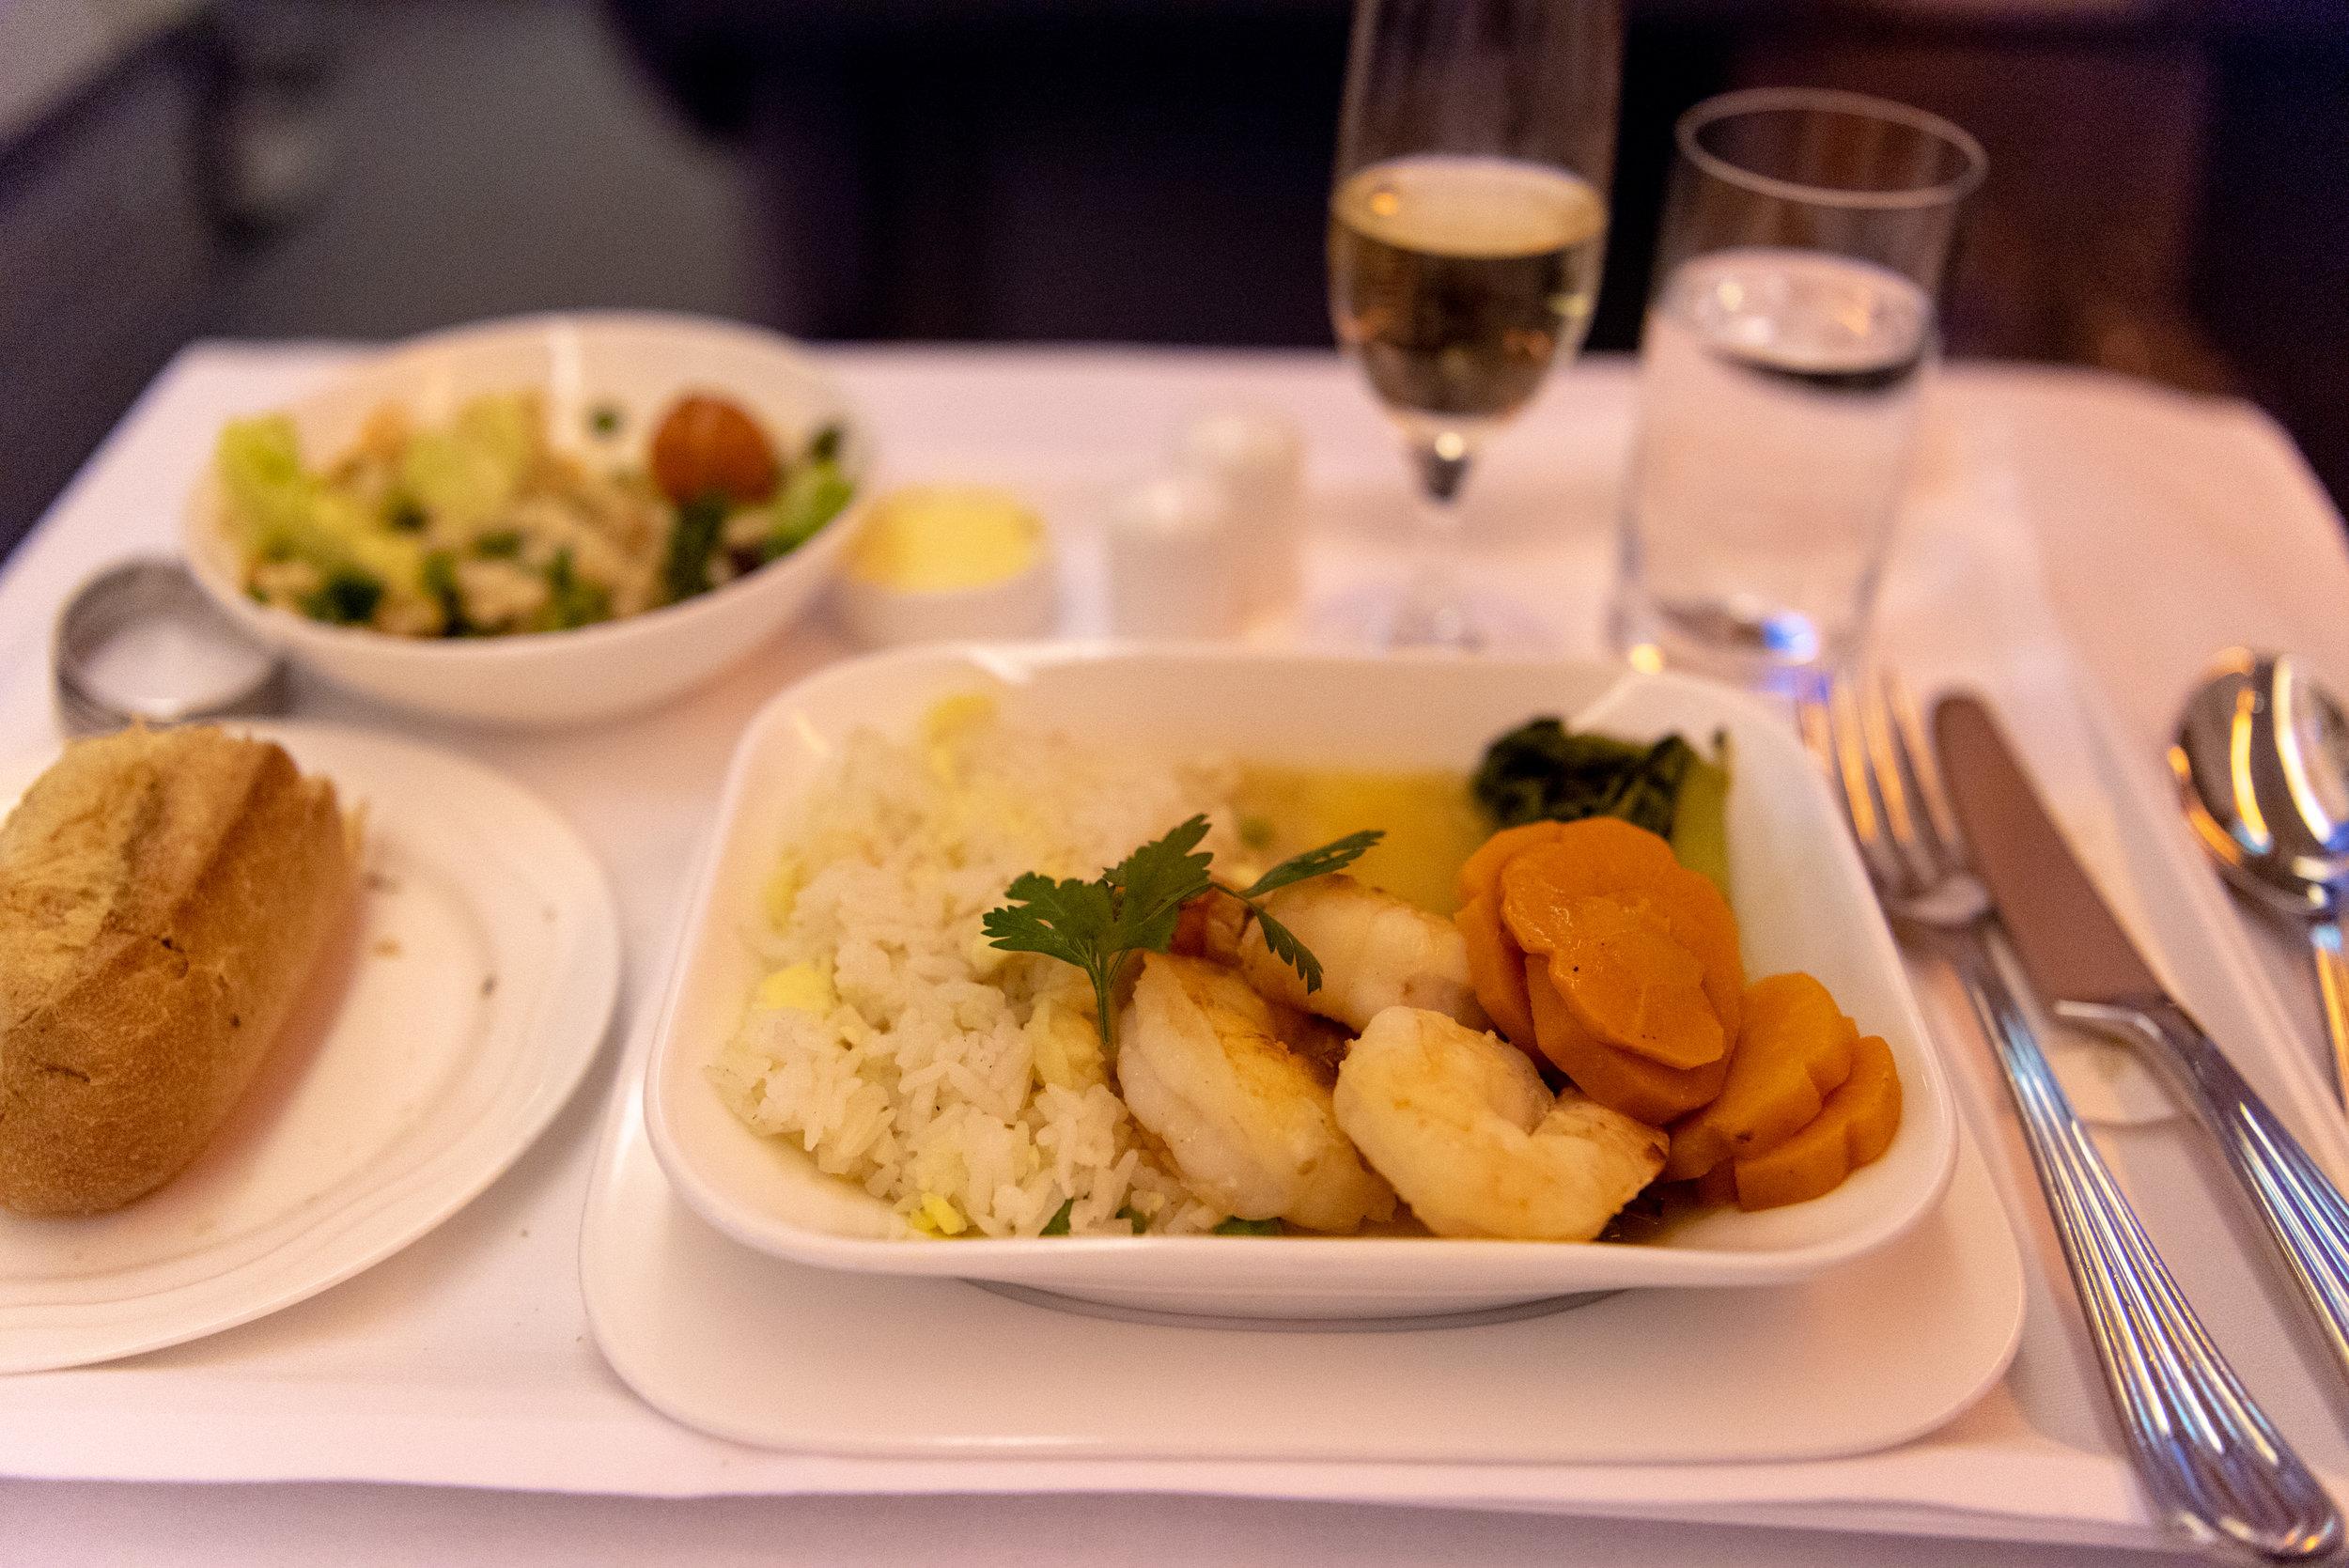 Grilled King Prawns  Emirates EK352 Business Class 777-300ER - DXB to SIN